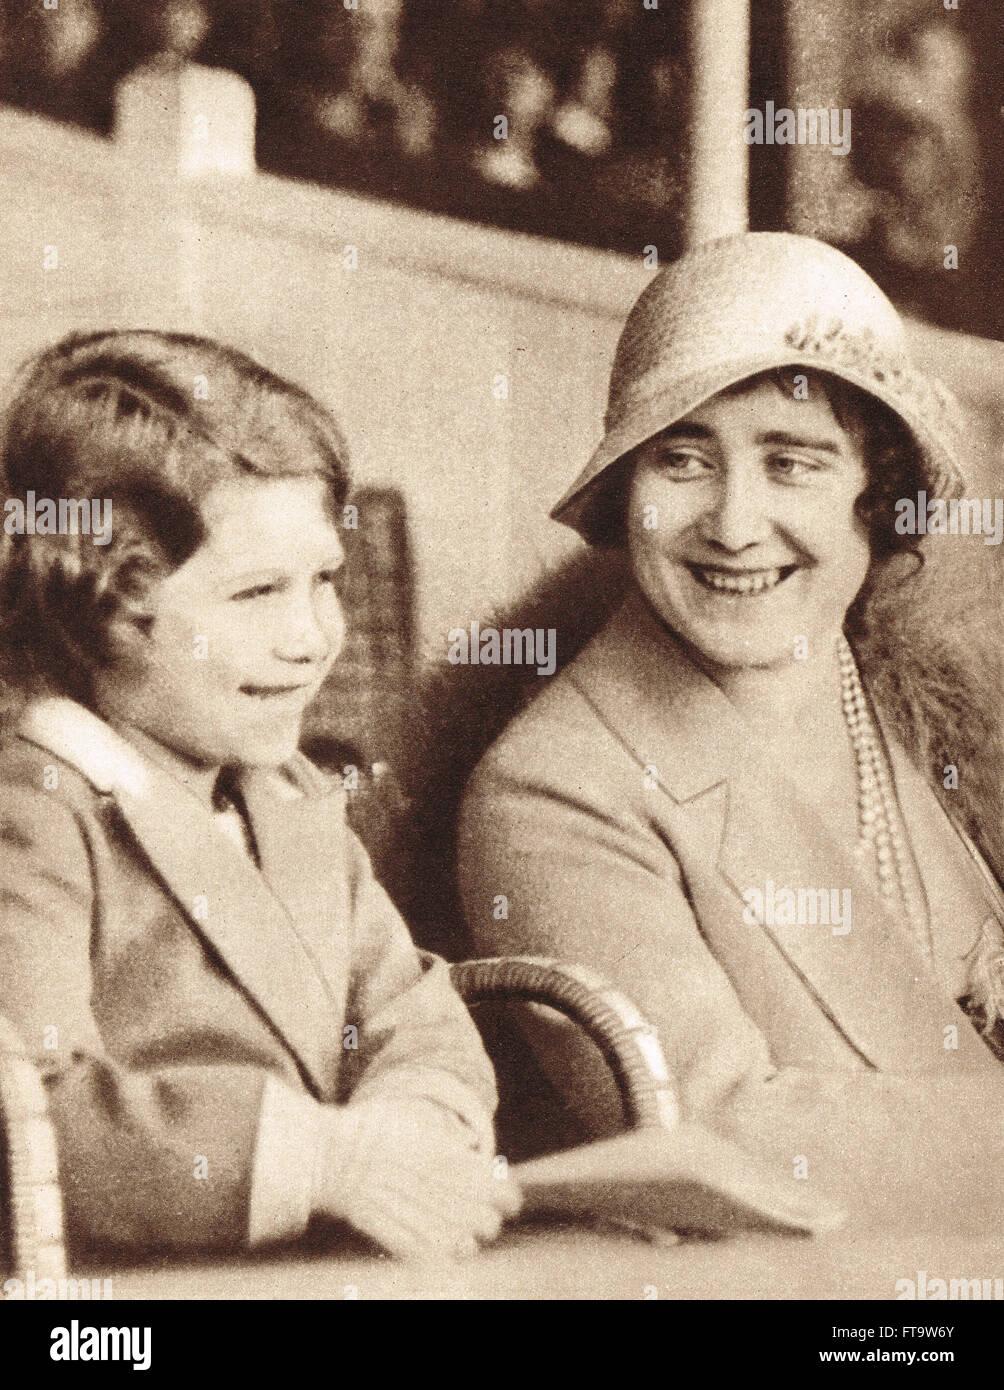 The future Elizabeth II age 6 at Aldershot Tattoo 1932 - Stock Image